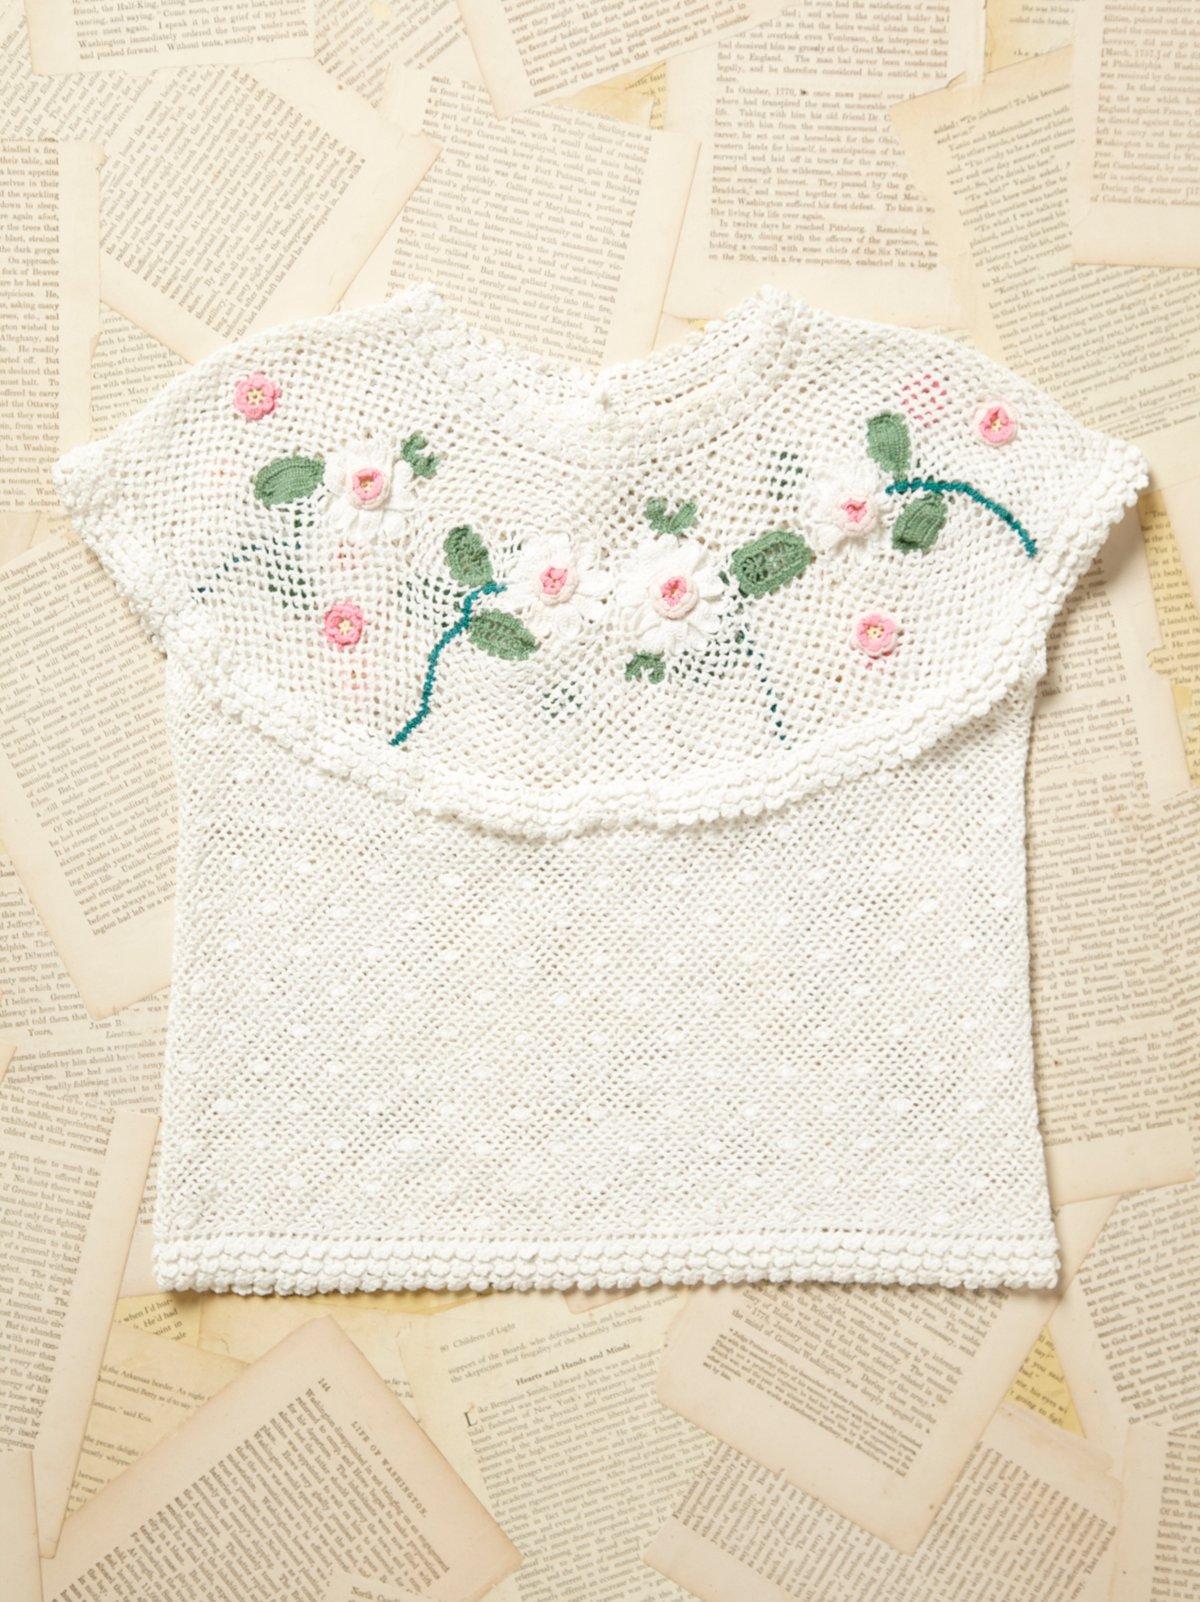 Vintage 1970s Floral Crochet Top